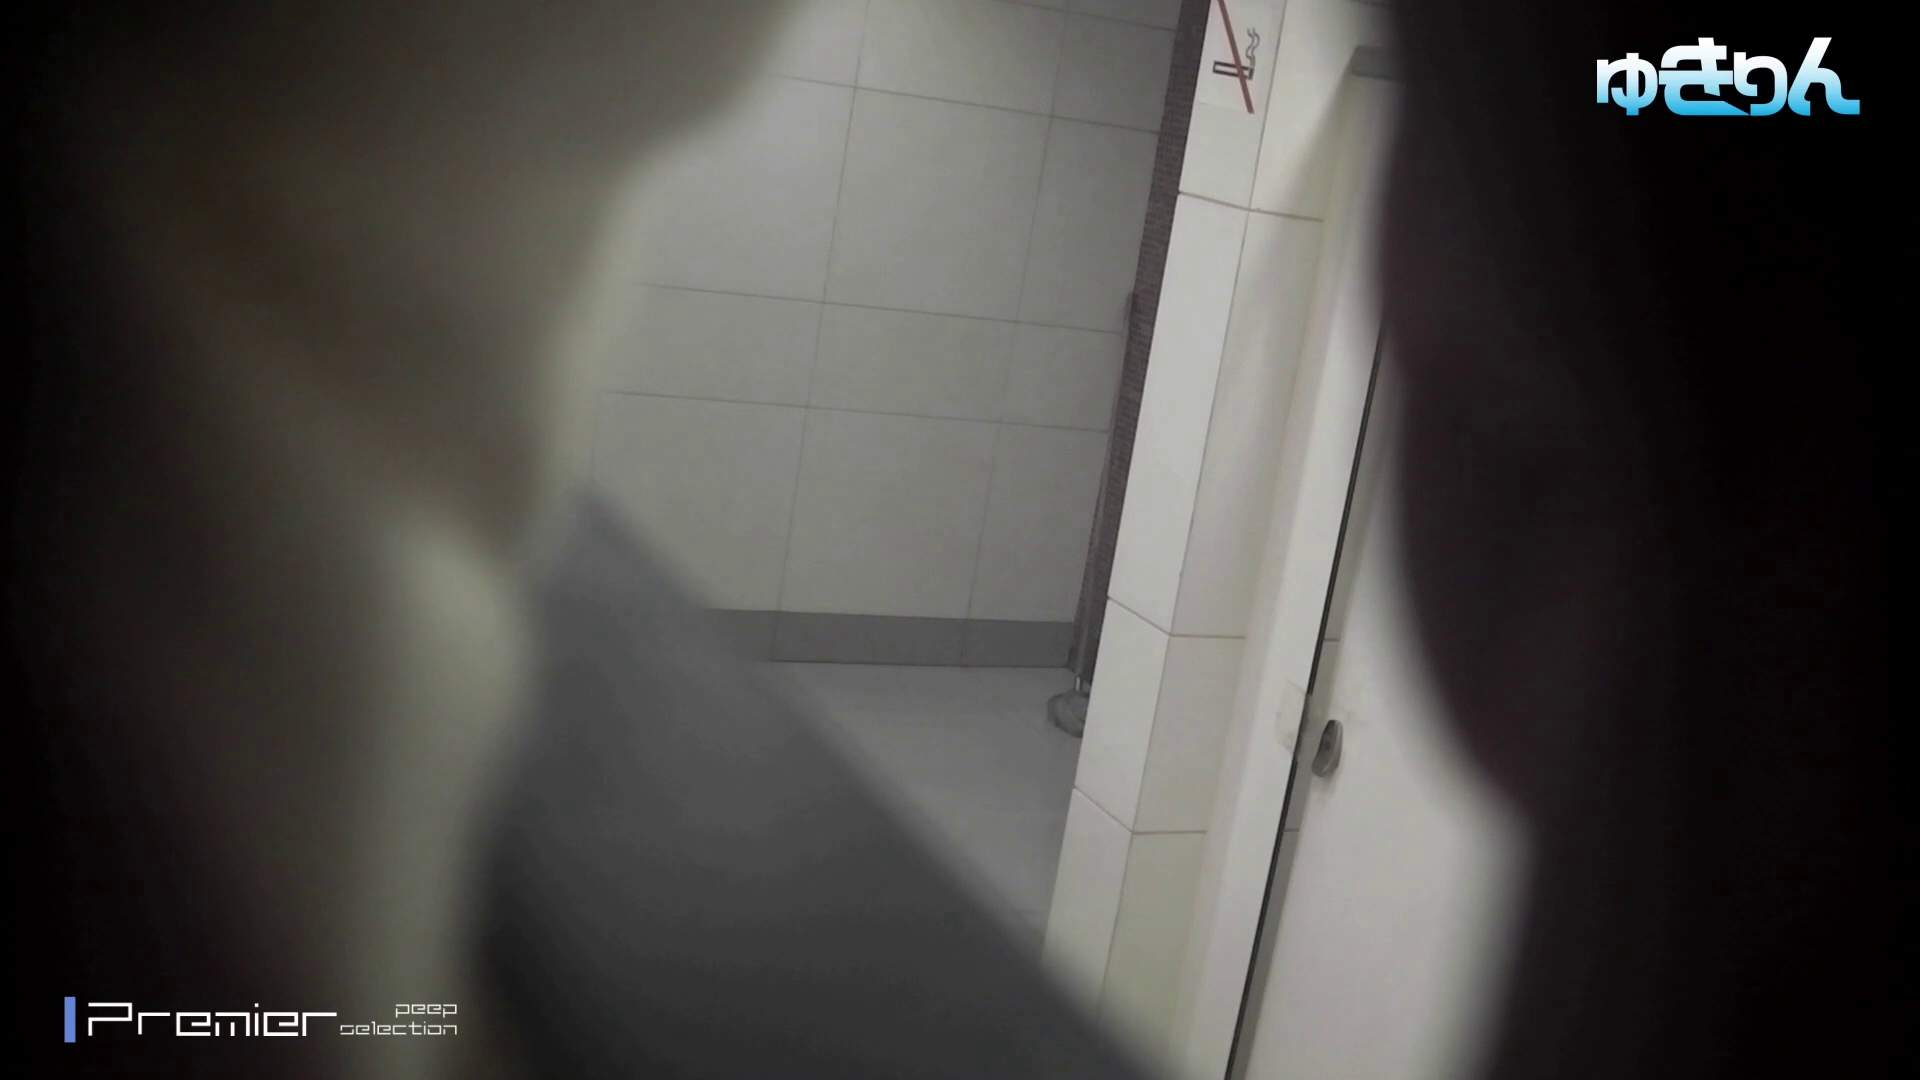 cm友達同士三人グループの二人を同時に捕獲【新世界の射窓からNo120】 むっちりガール オマンコ無修正動画無料 80枚 20